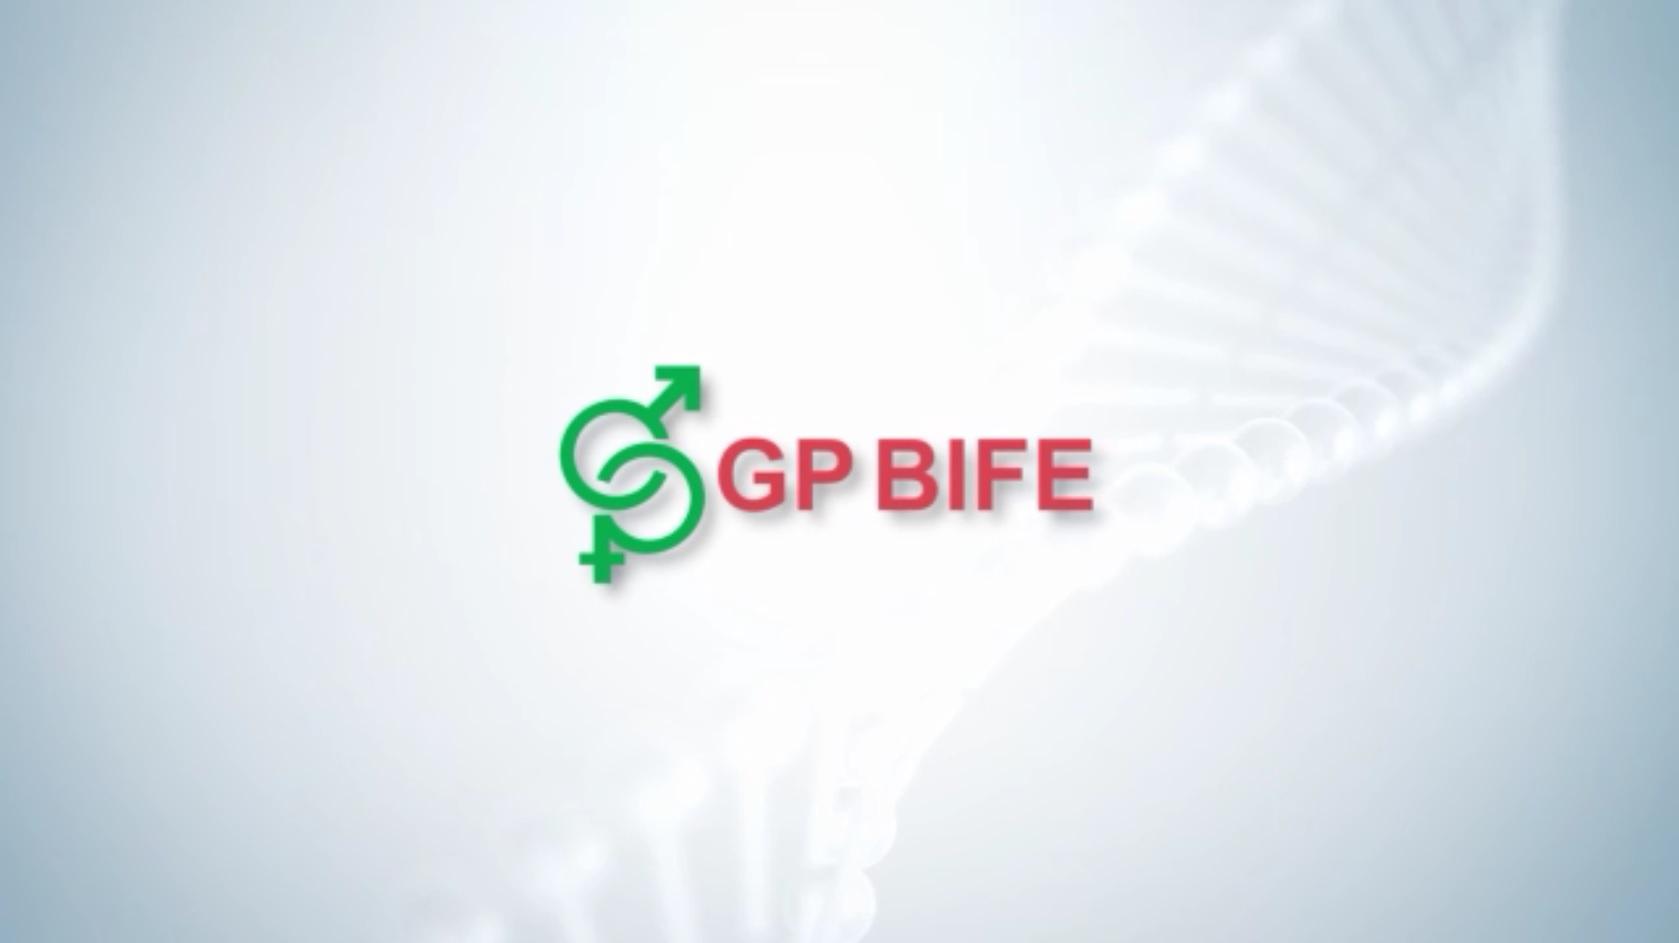 gpbife